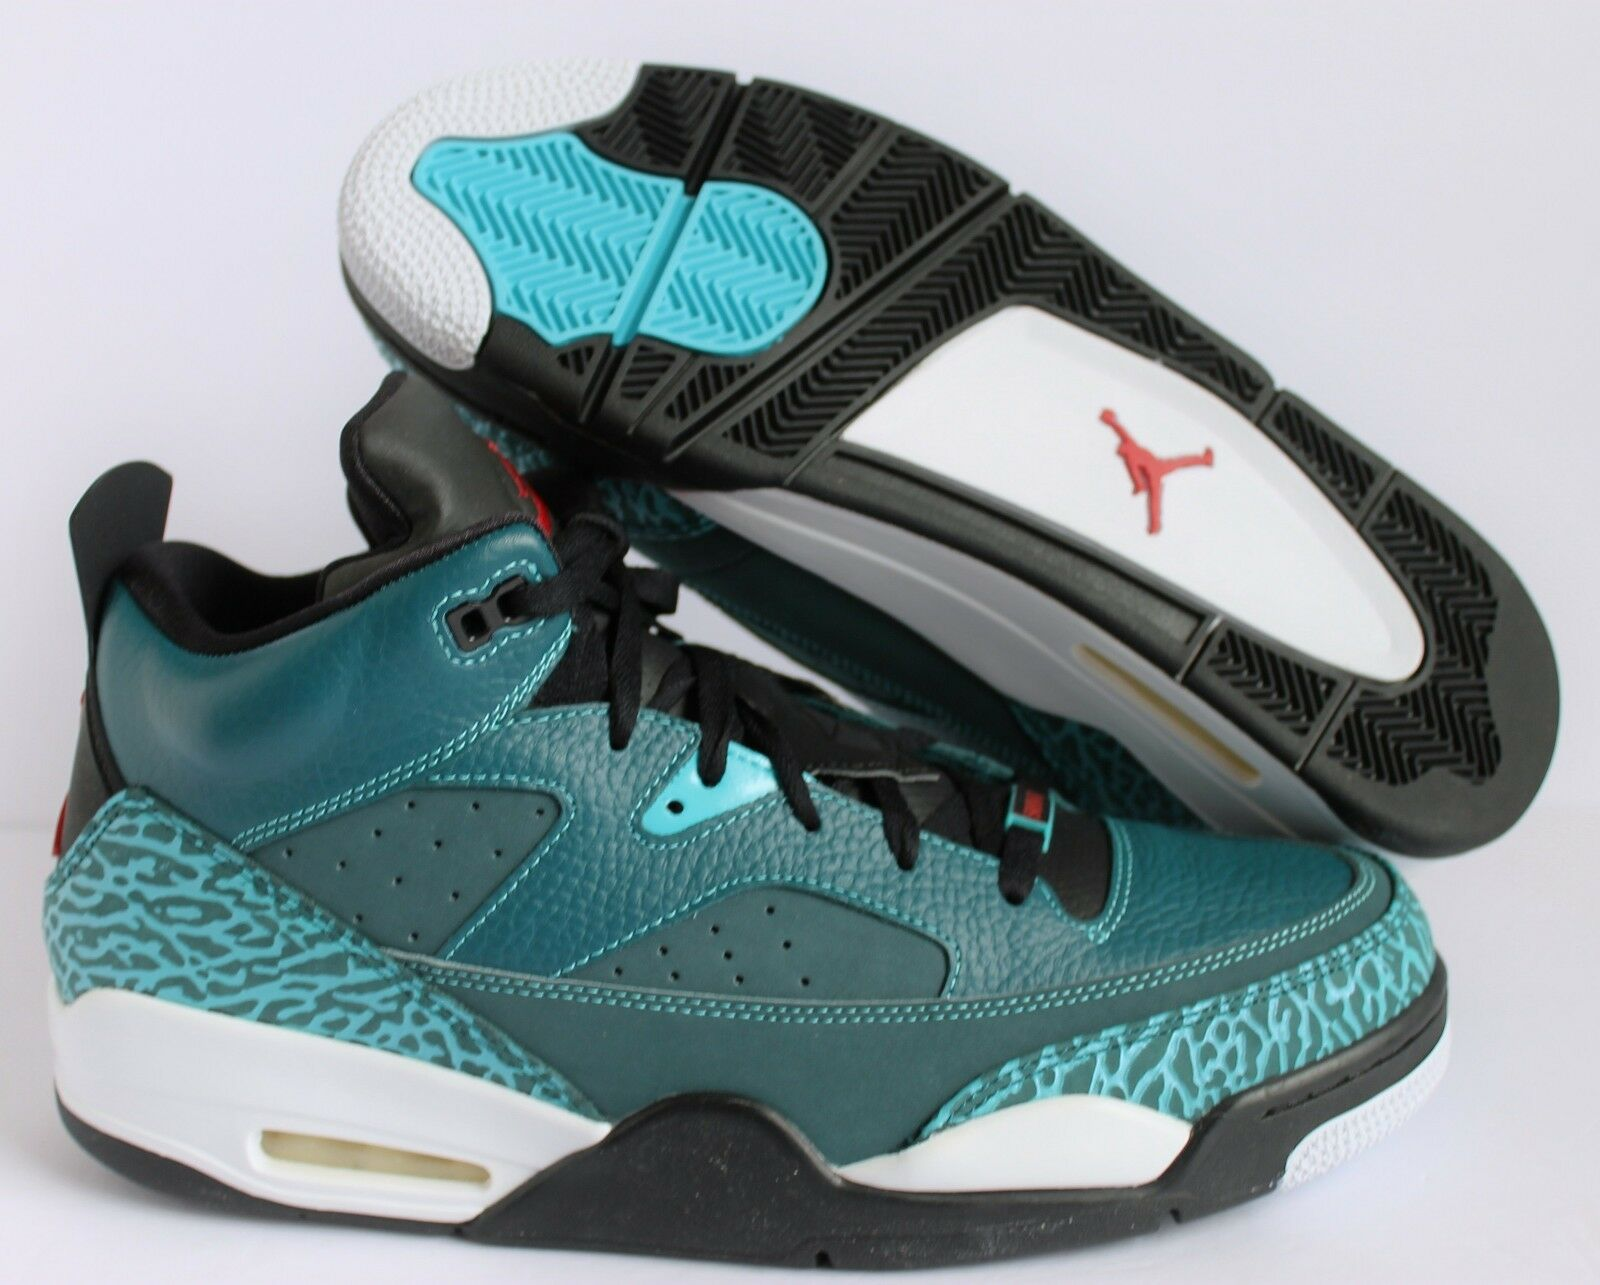 Nike Air Jordan Son RojoNegroblanco of Low oscuro seaGimnasio RojoNegroblanco Son [580603303] 486c4e